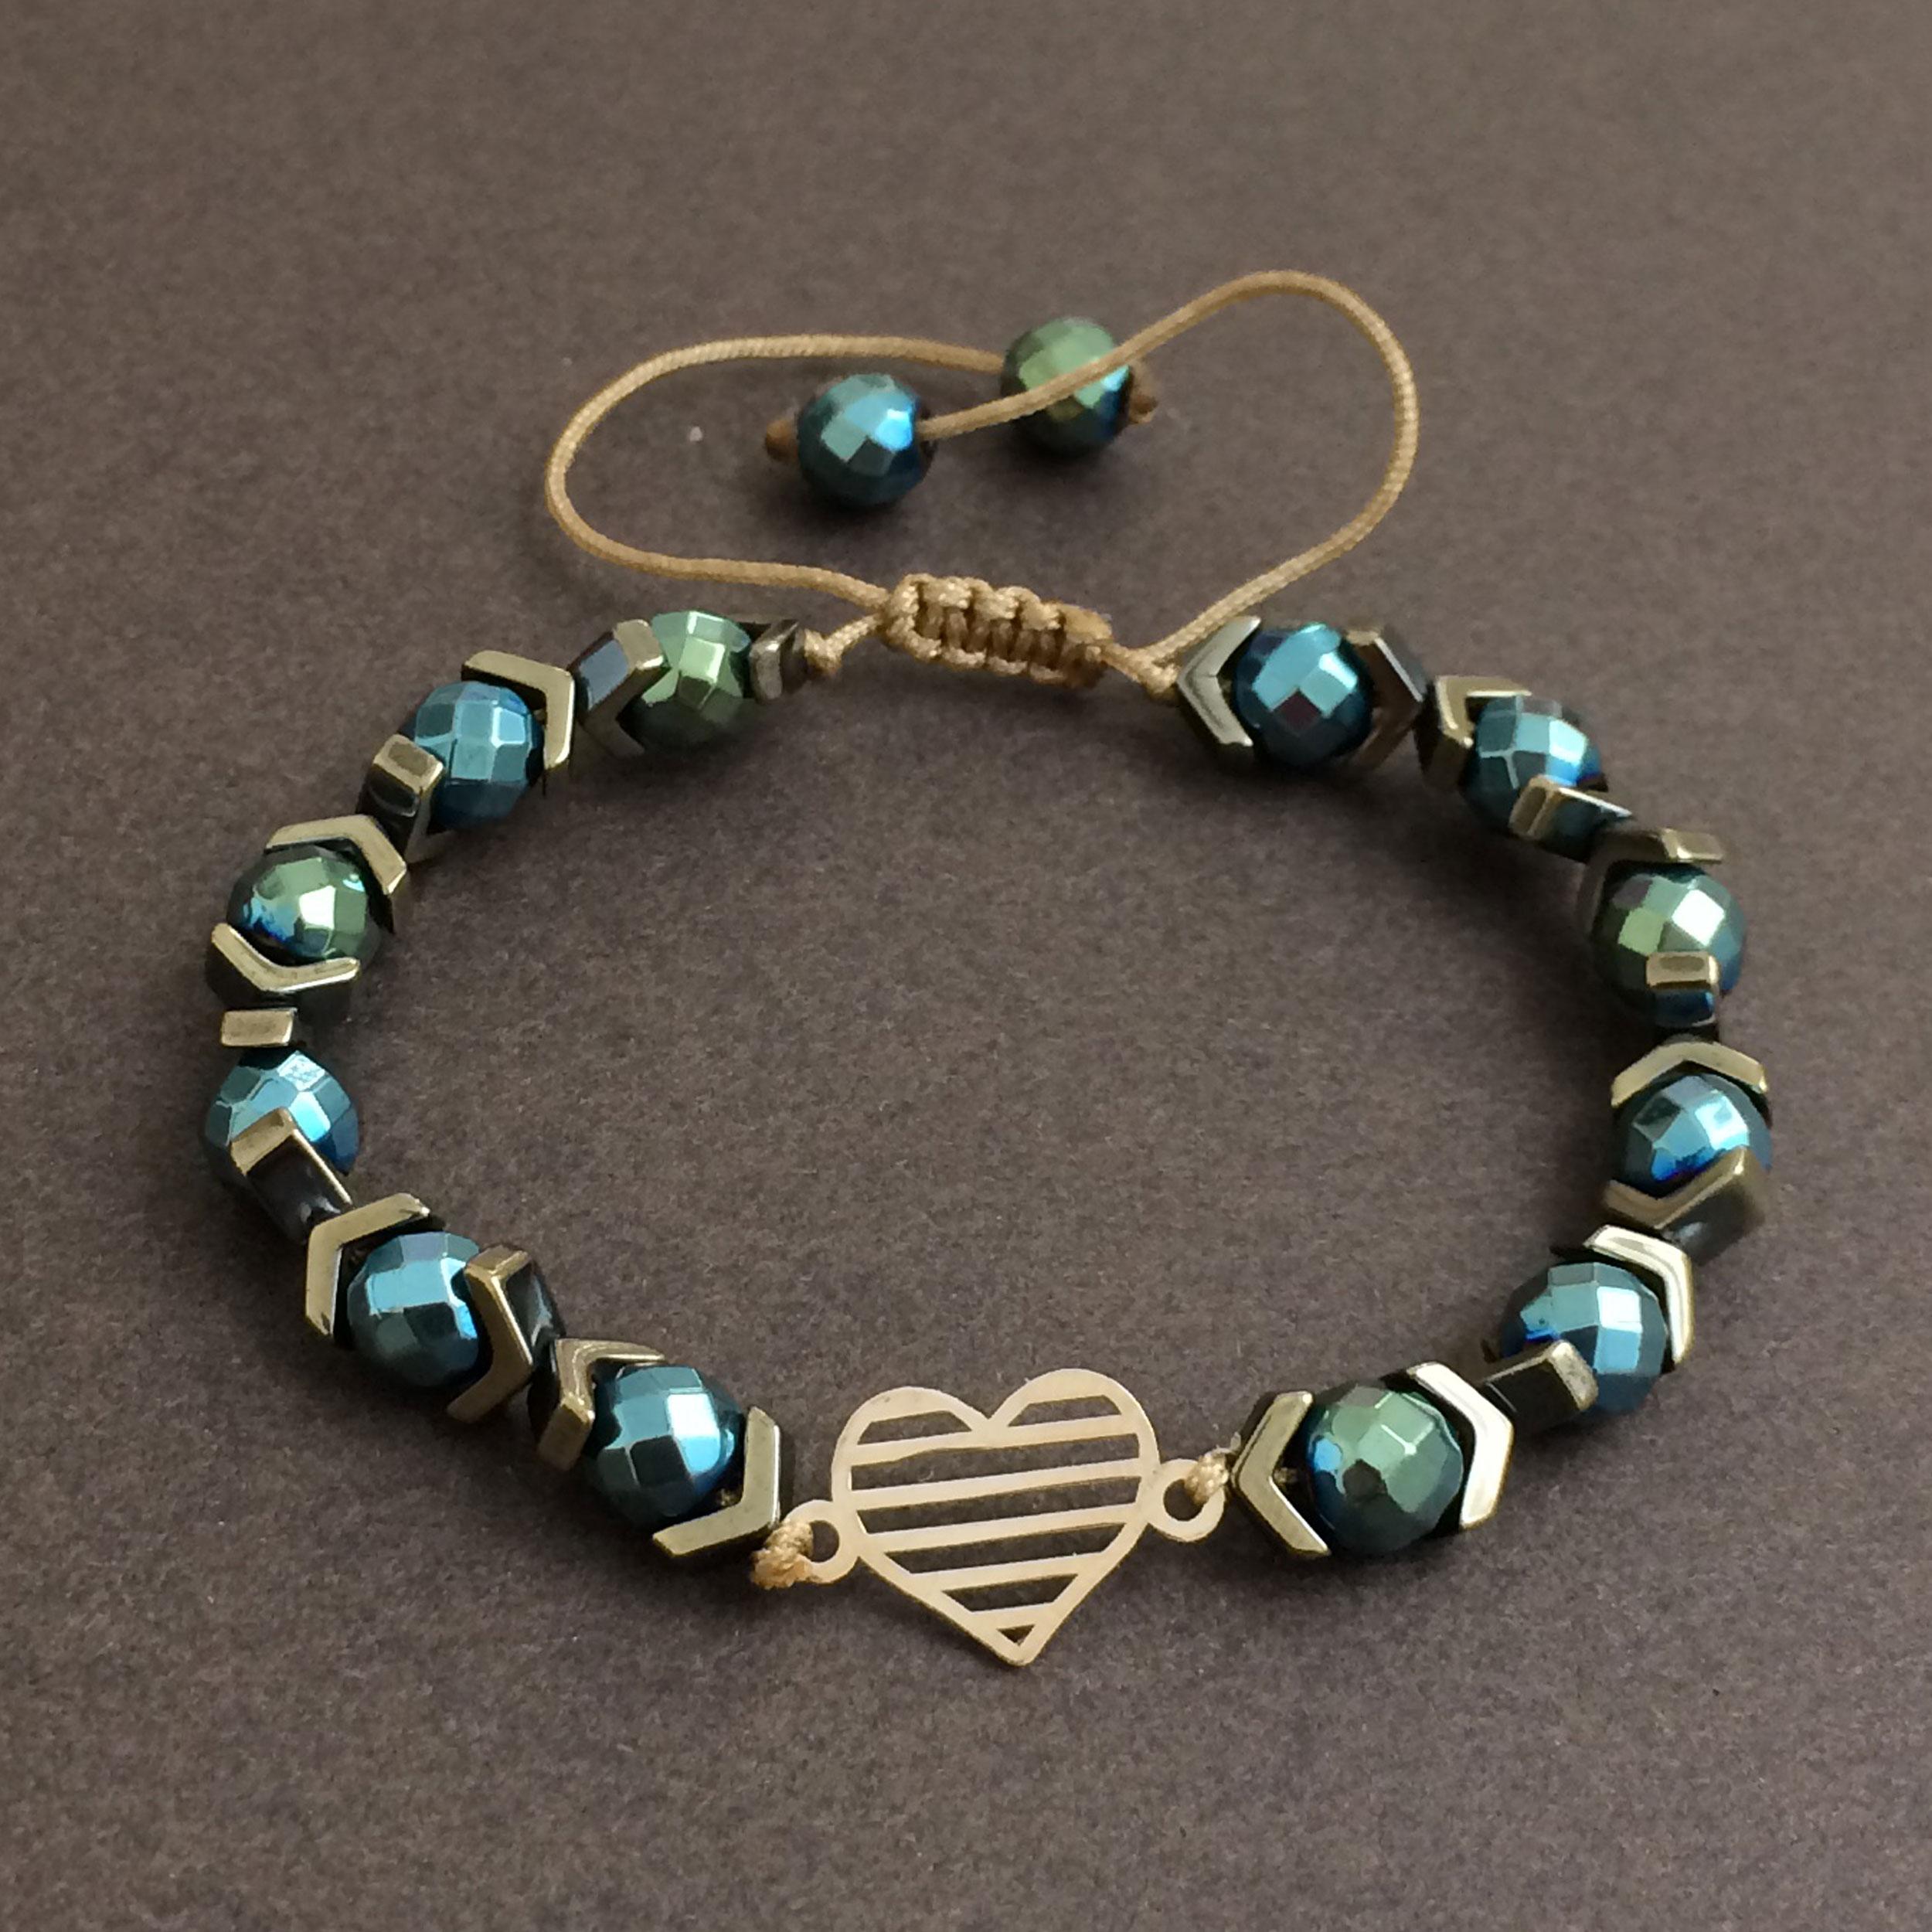 دستبند طلا 18 عیار زنانه الماسین آذر کد GHALB02 -  - 2